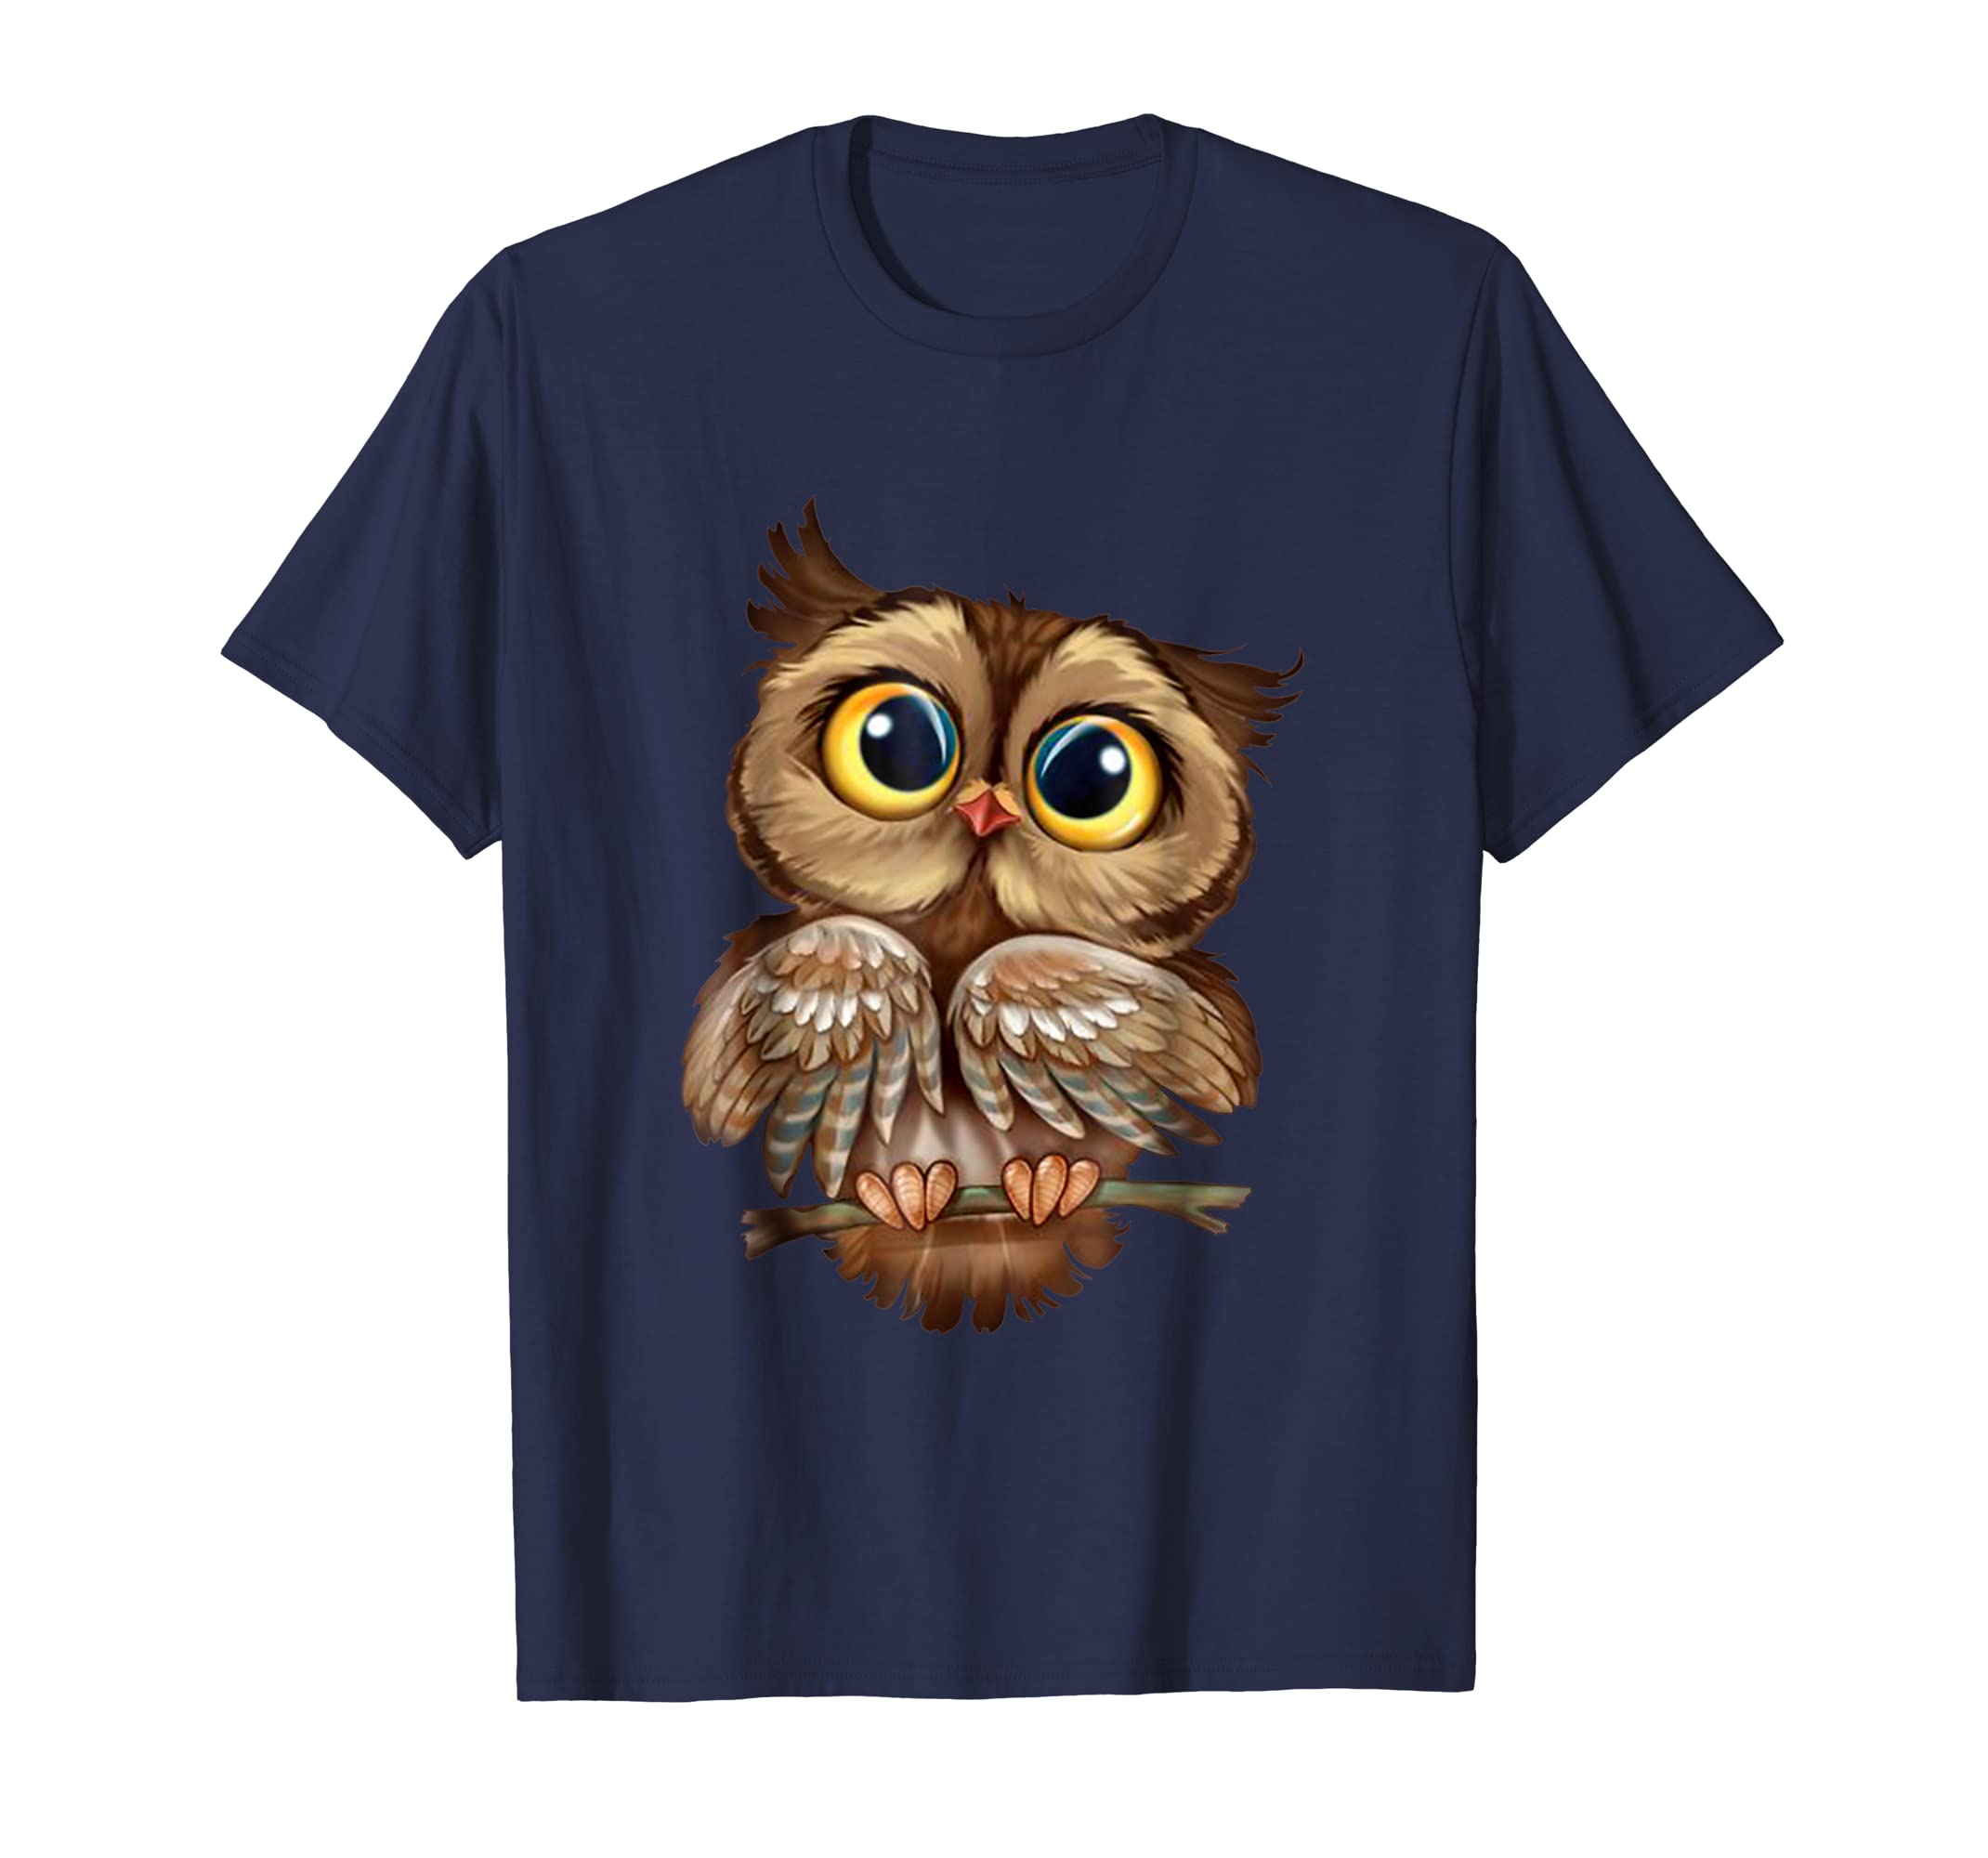 Owl Cute Owl Shirt For Women Girls-mt